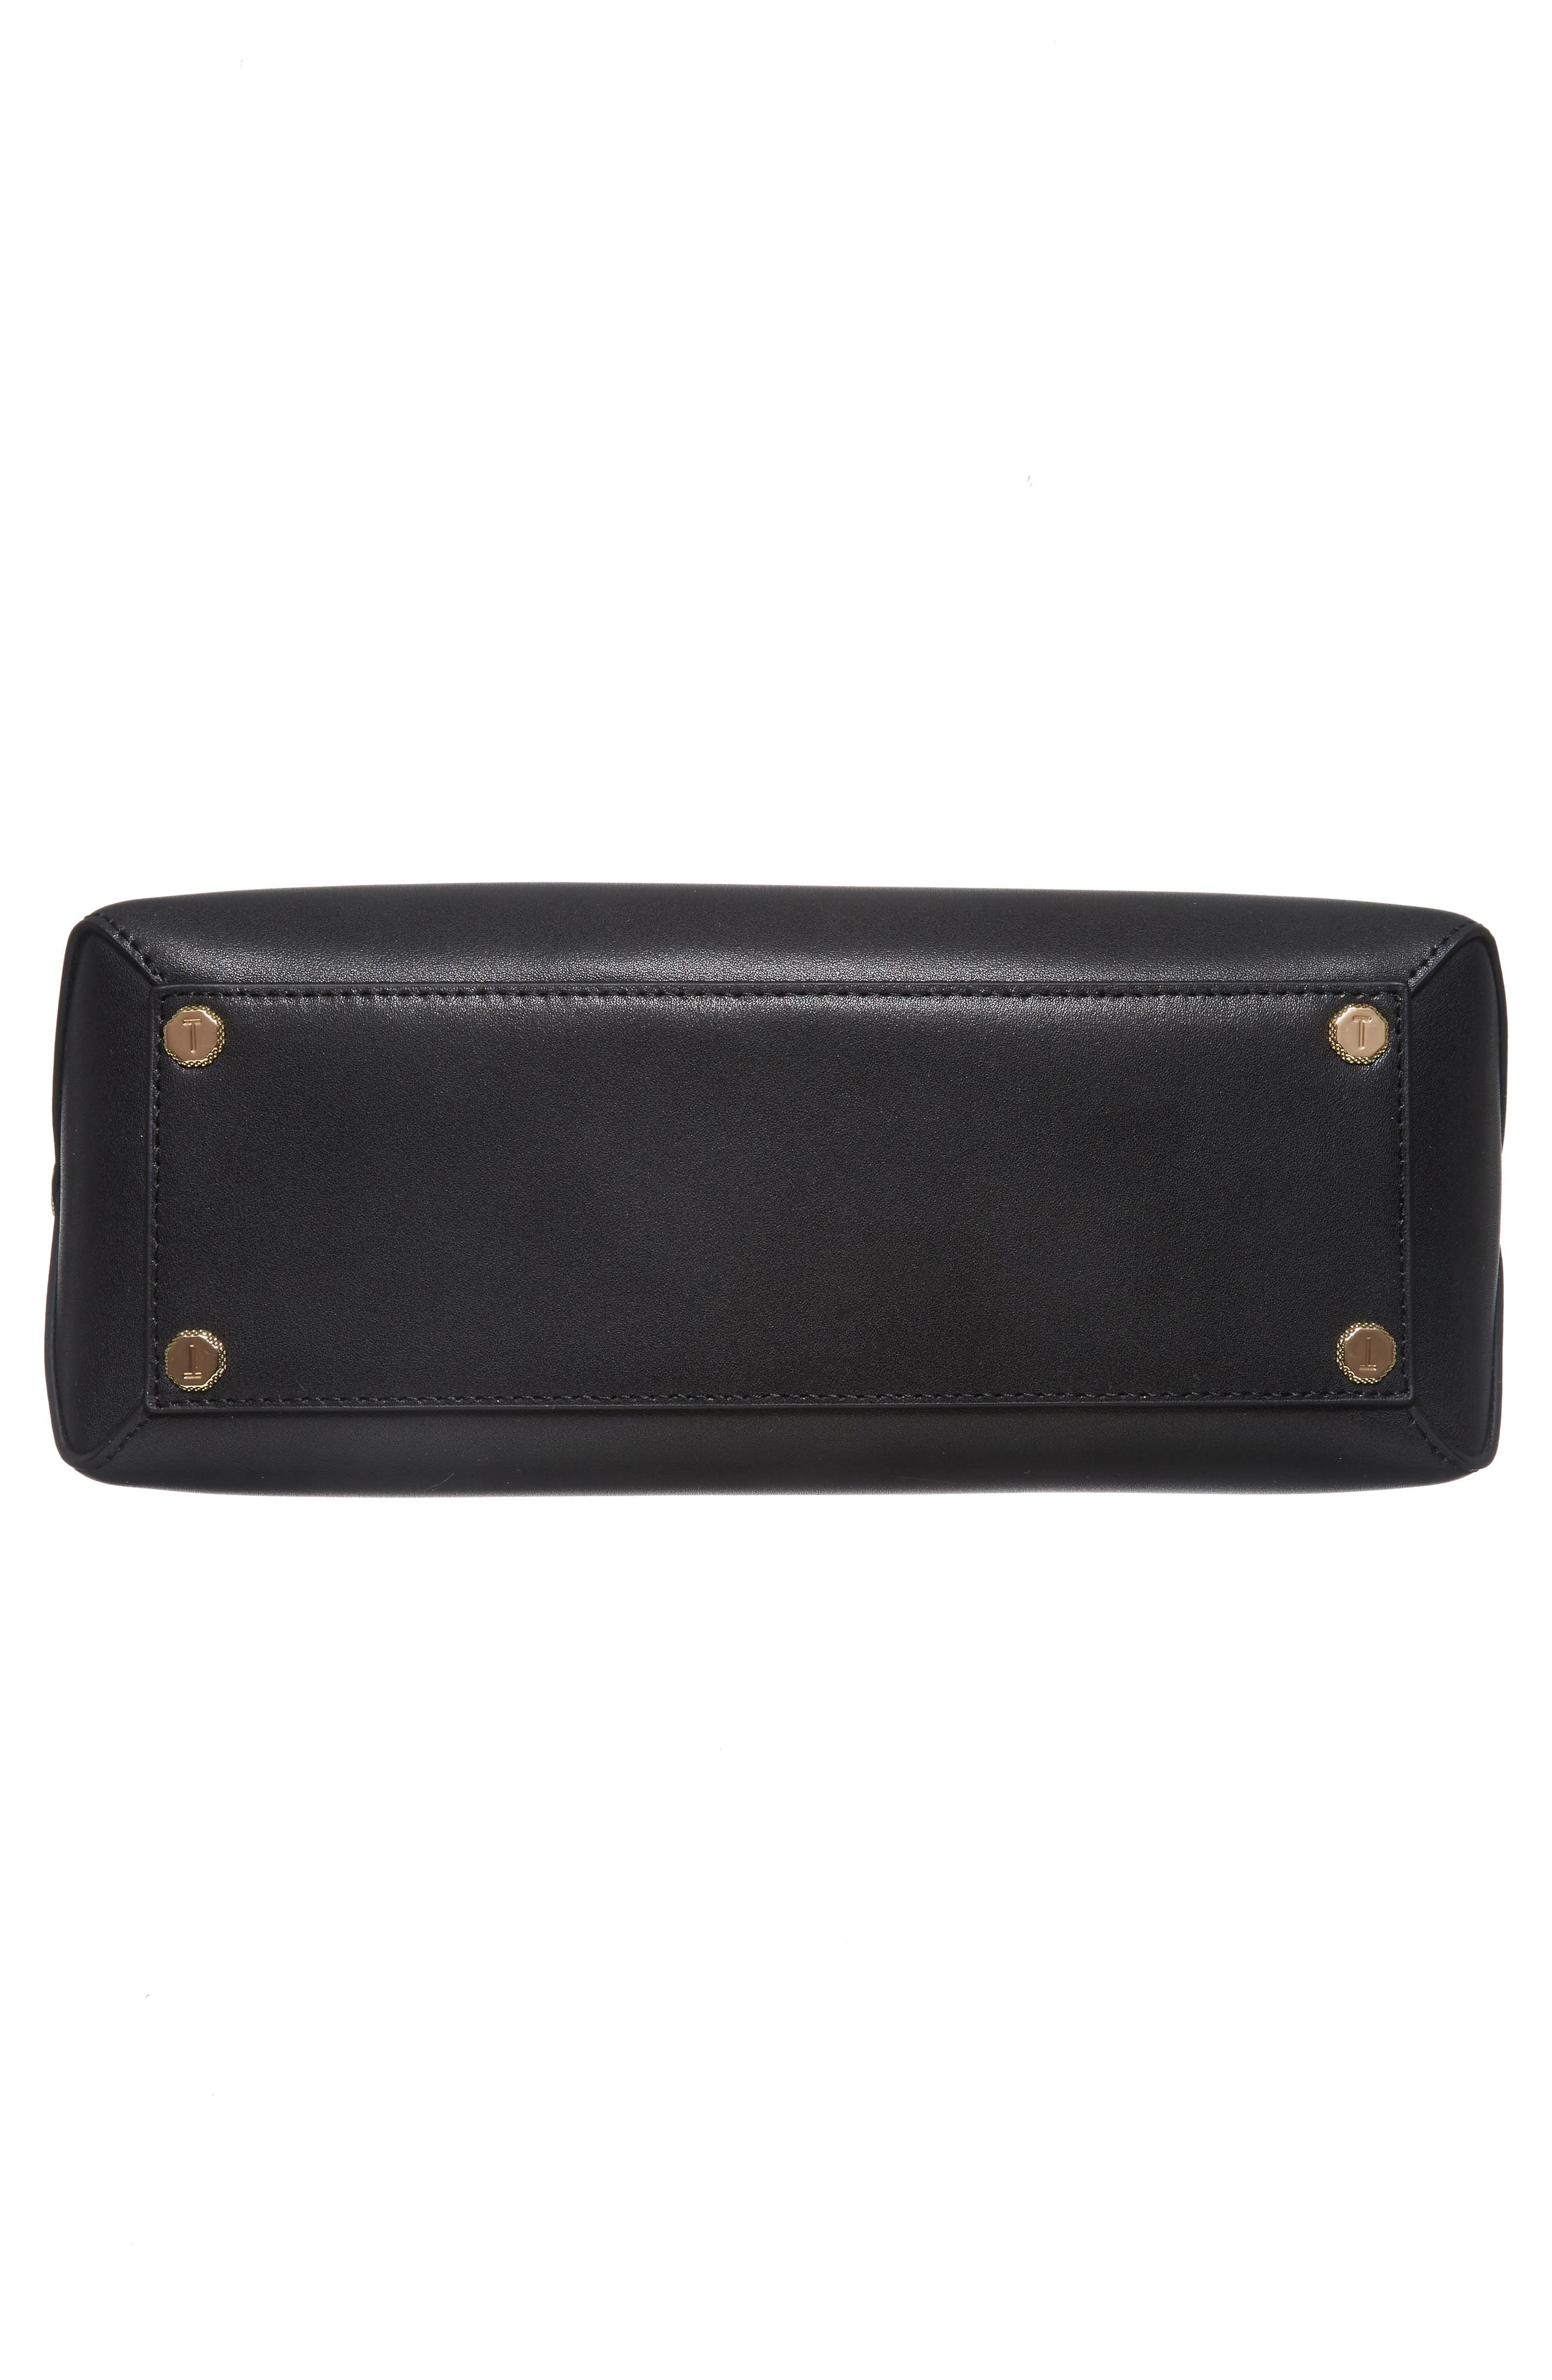 Taymar - Studded Edge Lady Bag Leather Top Handle Satchel,                             Alternate thumbnail 6, color,                             001